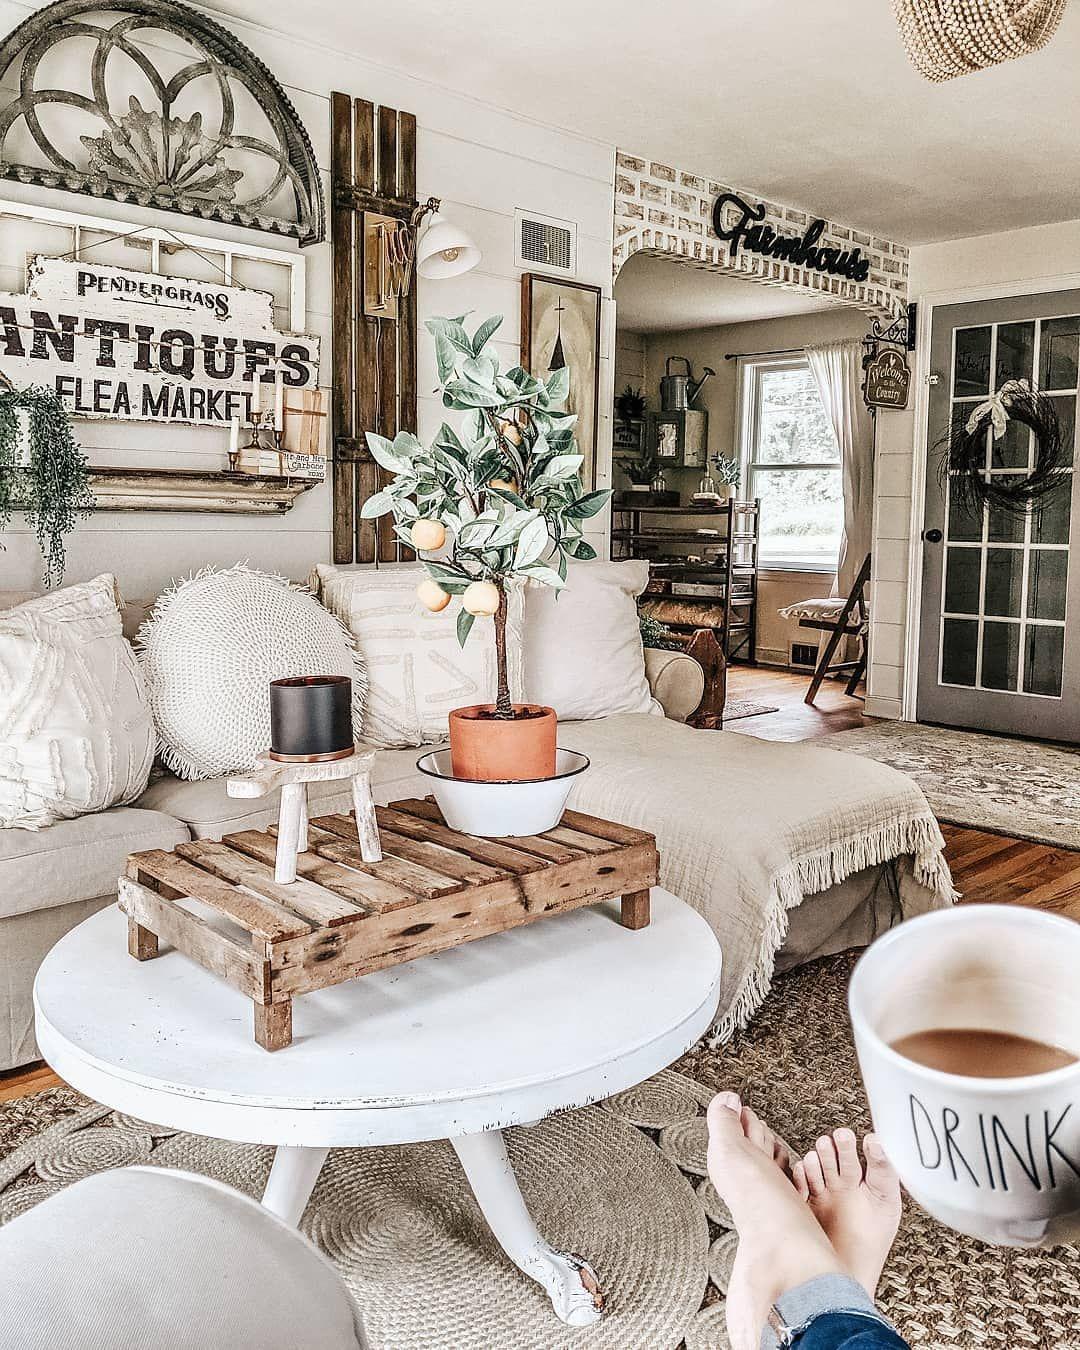 Pin By Aiyanna Nicole On Bohemian Decor Home Country Farmhouse